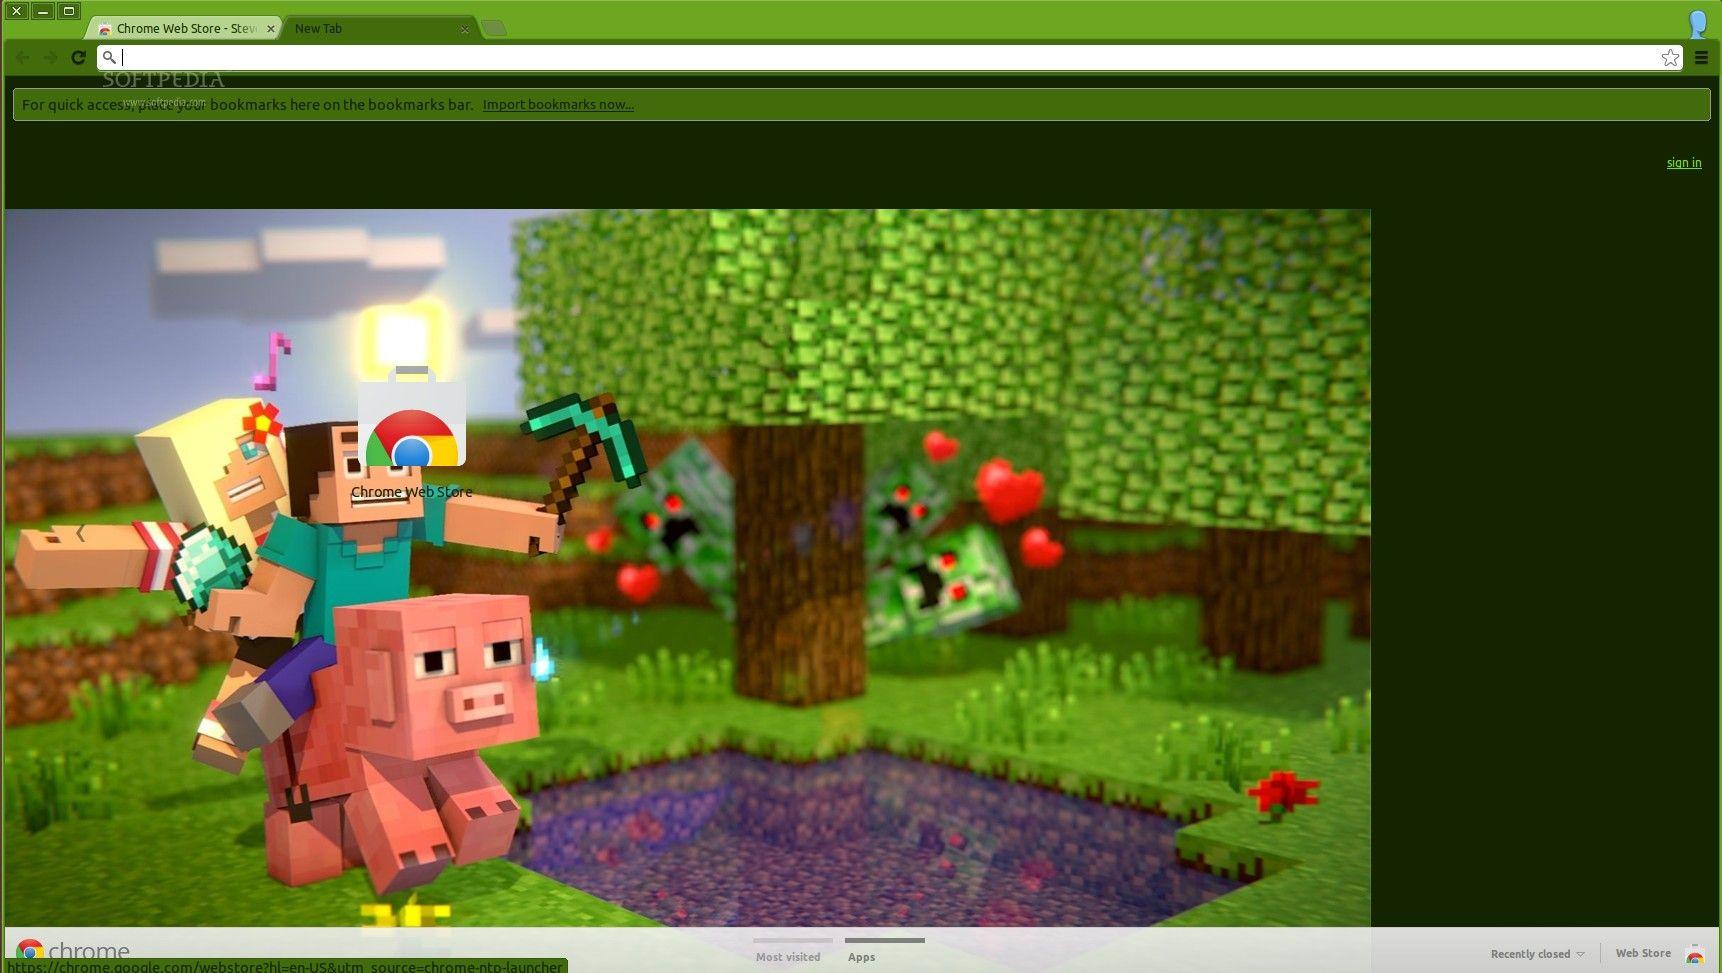 minecraft scenes | The Steve Scene Minecraft Theme applied